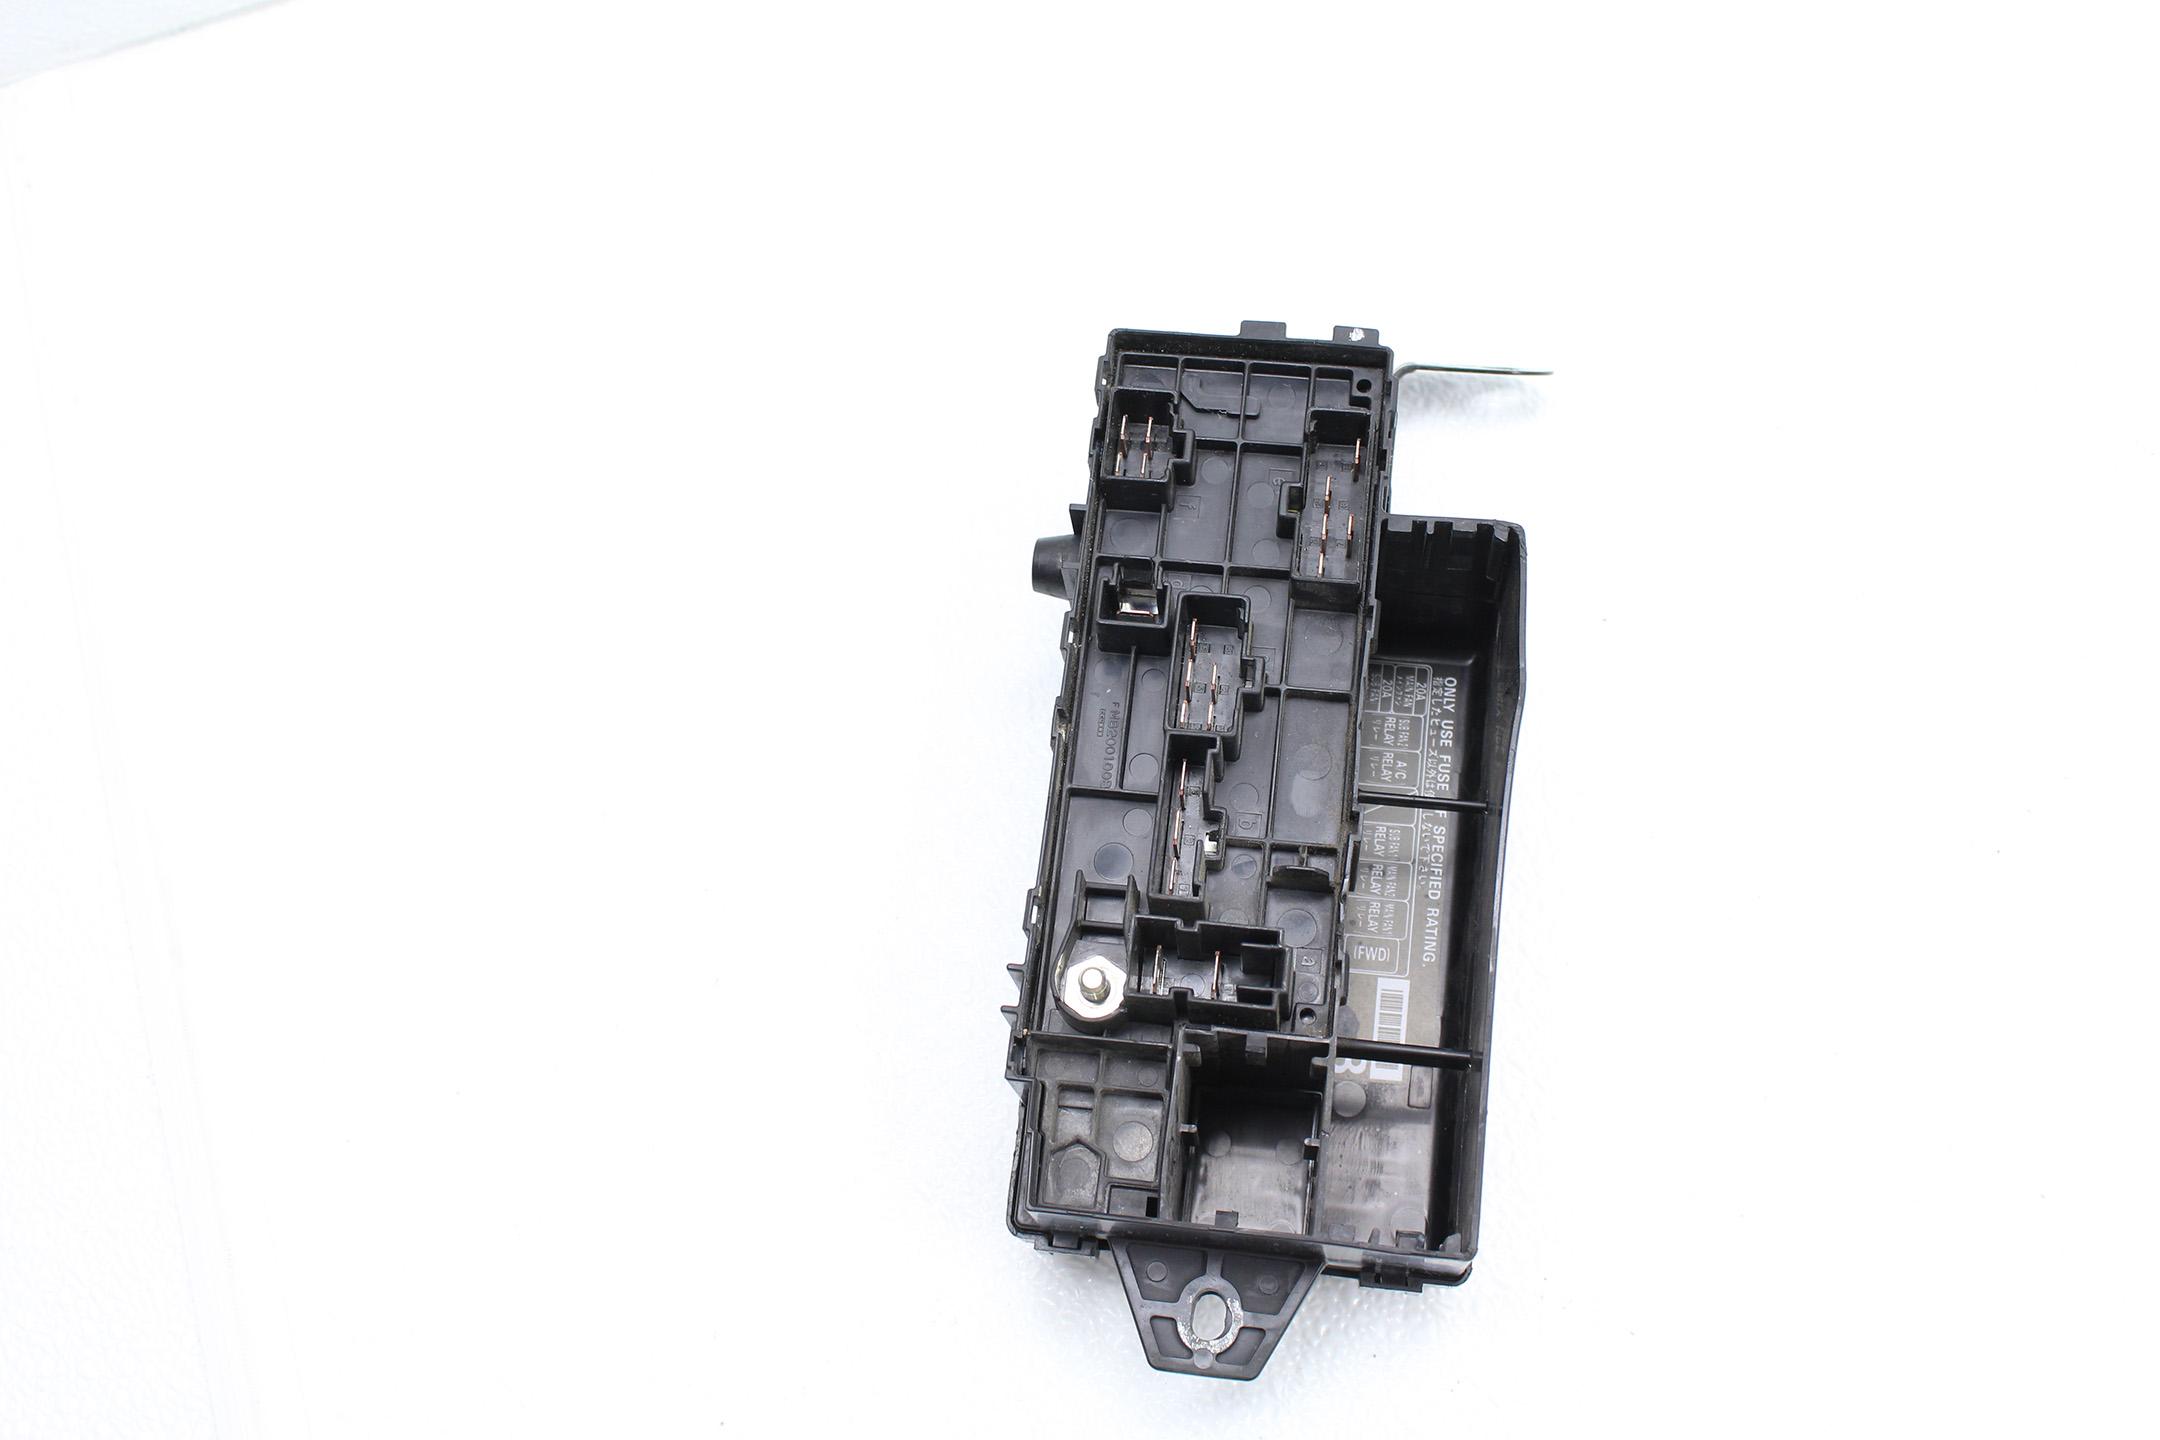 1998-2001 SUBARU IMPREZA 2.5 RS GC8 ENGINE FUSE BOX RELAY COVER ASSEMBLY